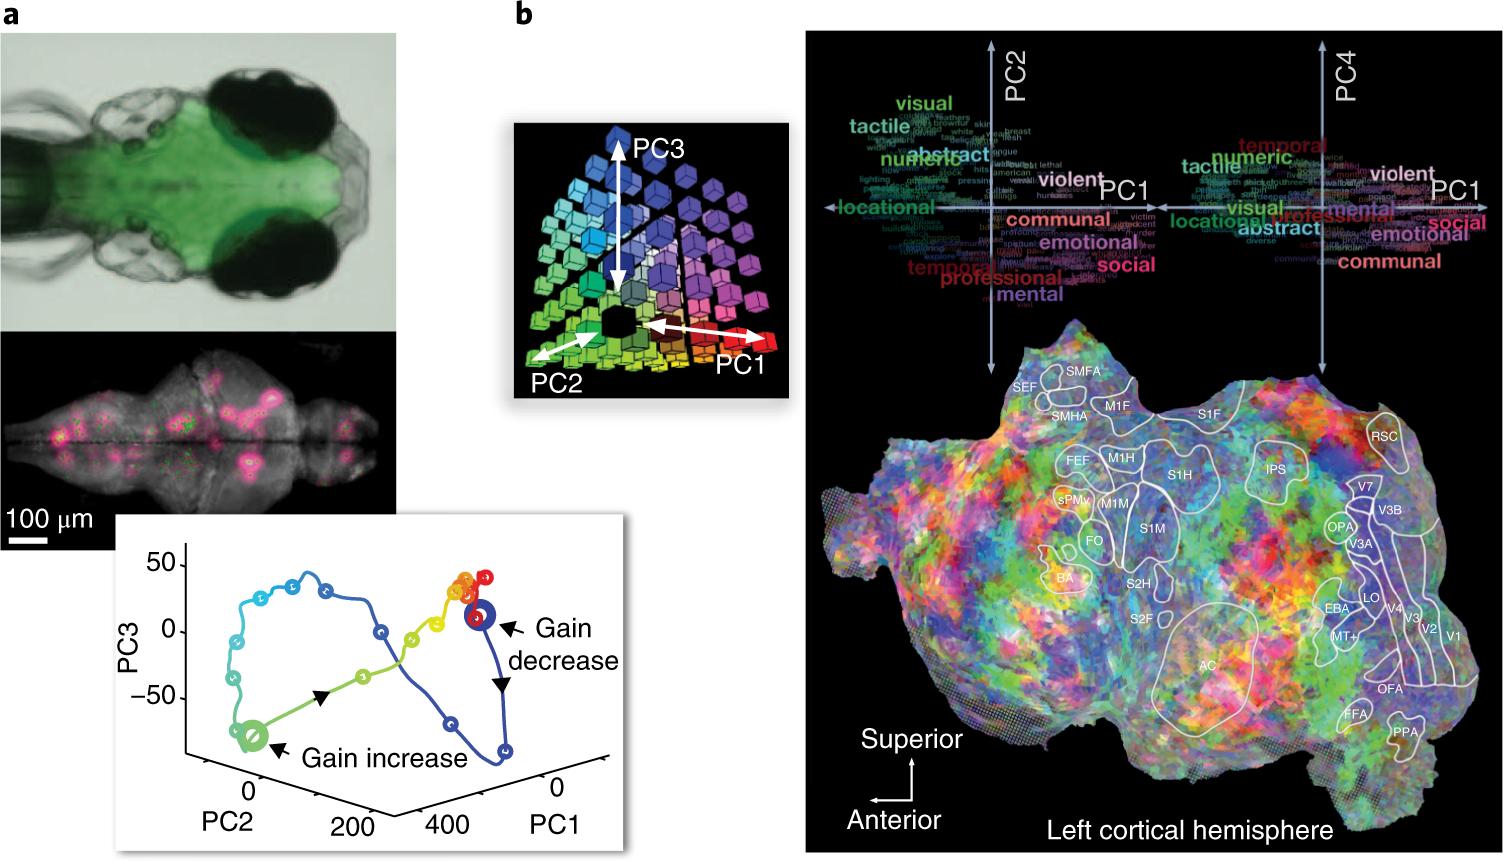 Cognitive computational neuroscience | Nature Neuroscience